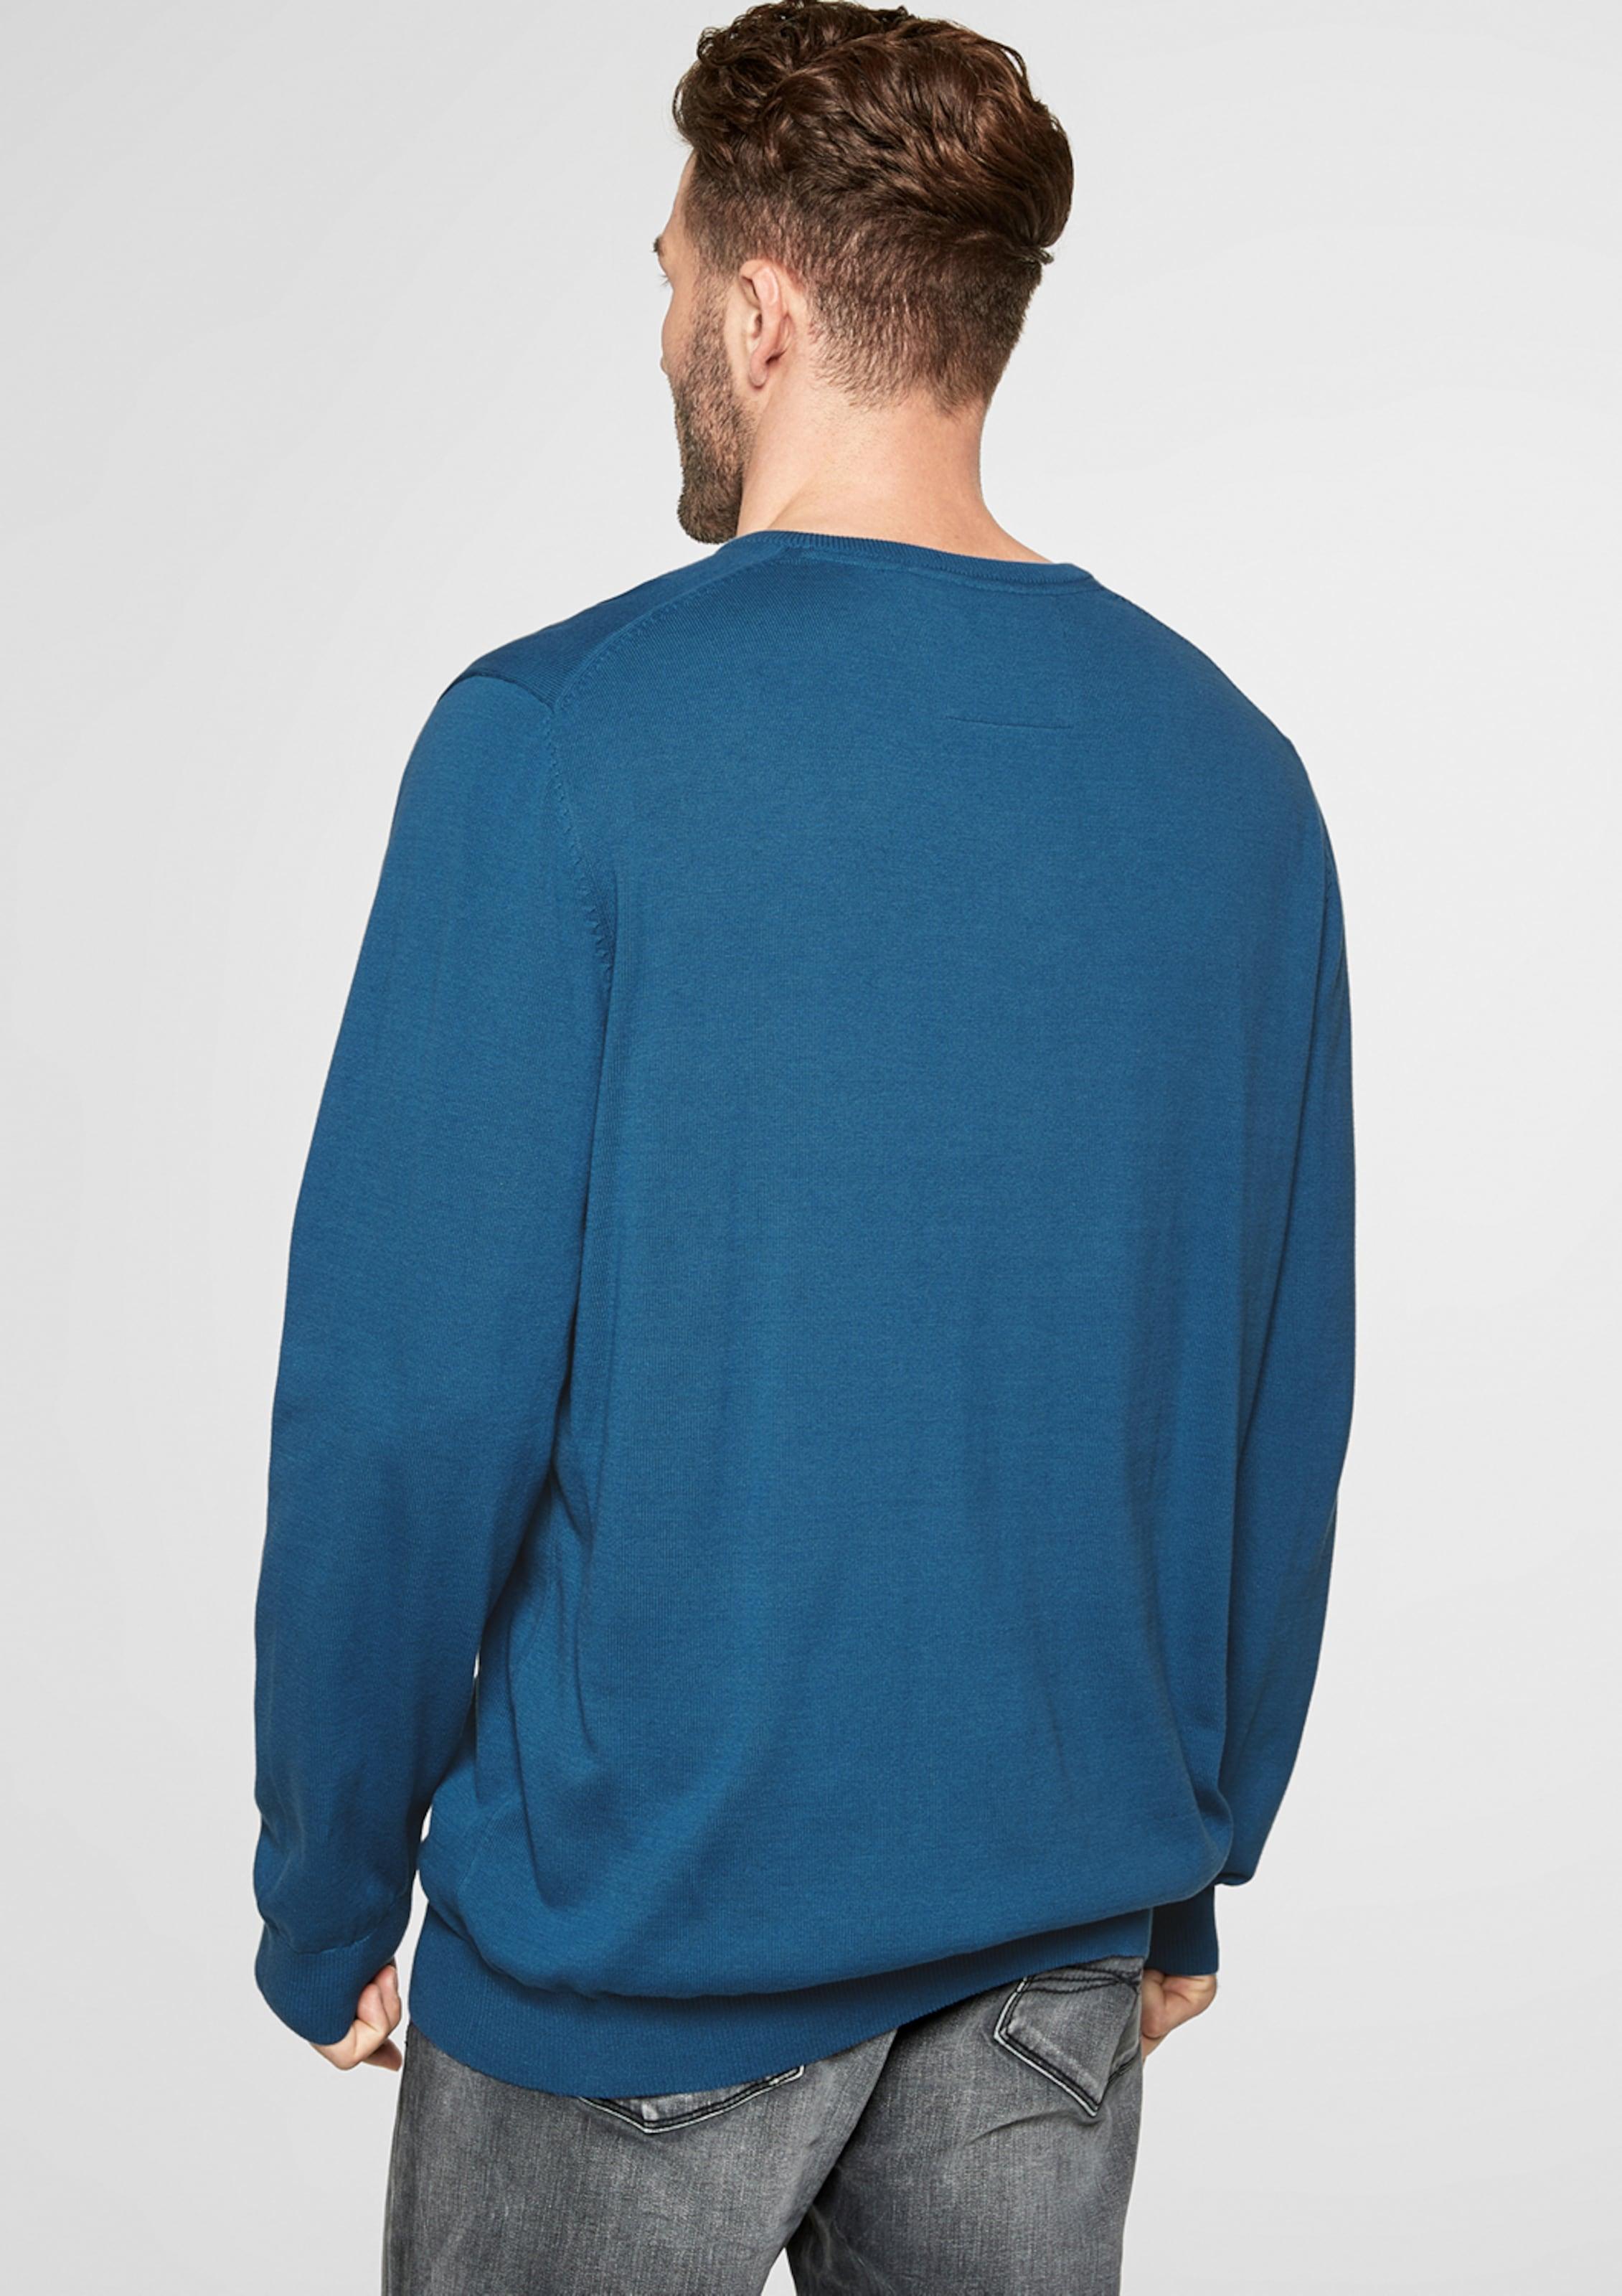 Label In Pullover oliver S Red Himmelblau 0nkwOP8X